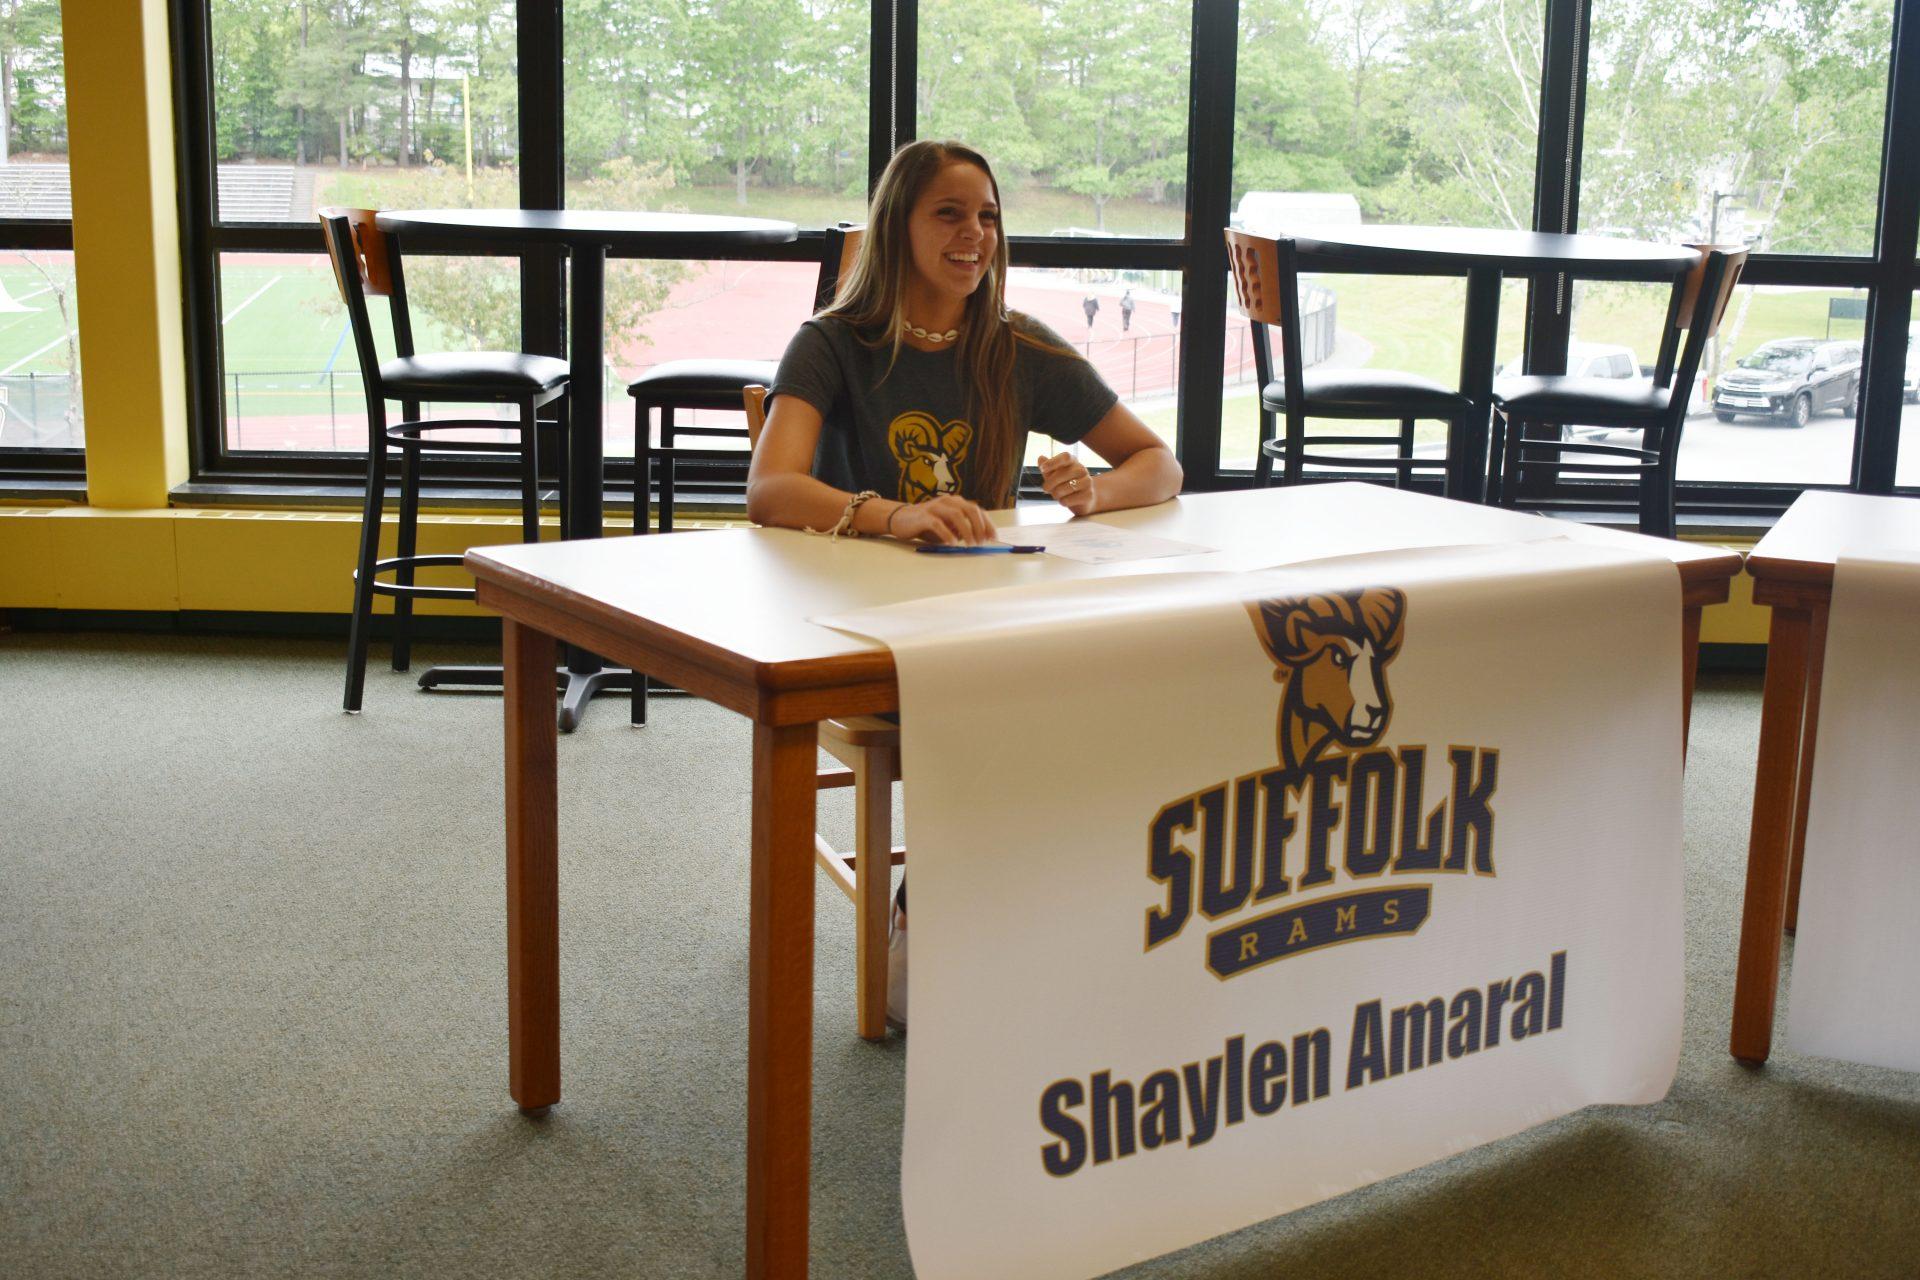 Shaylen Amaral Athletic Signing